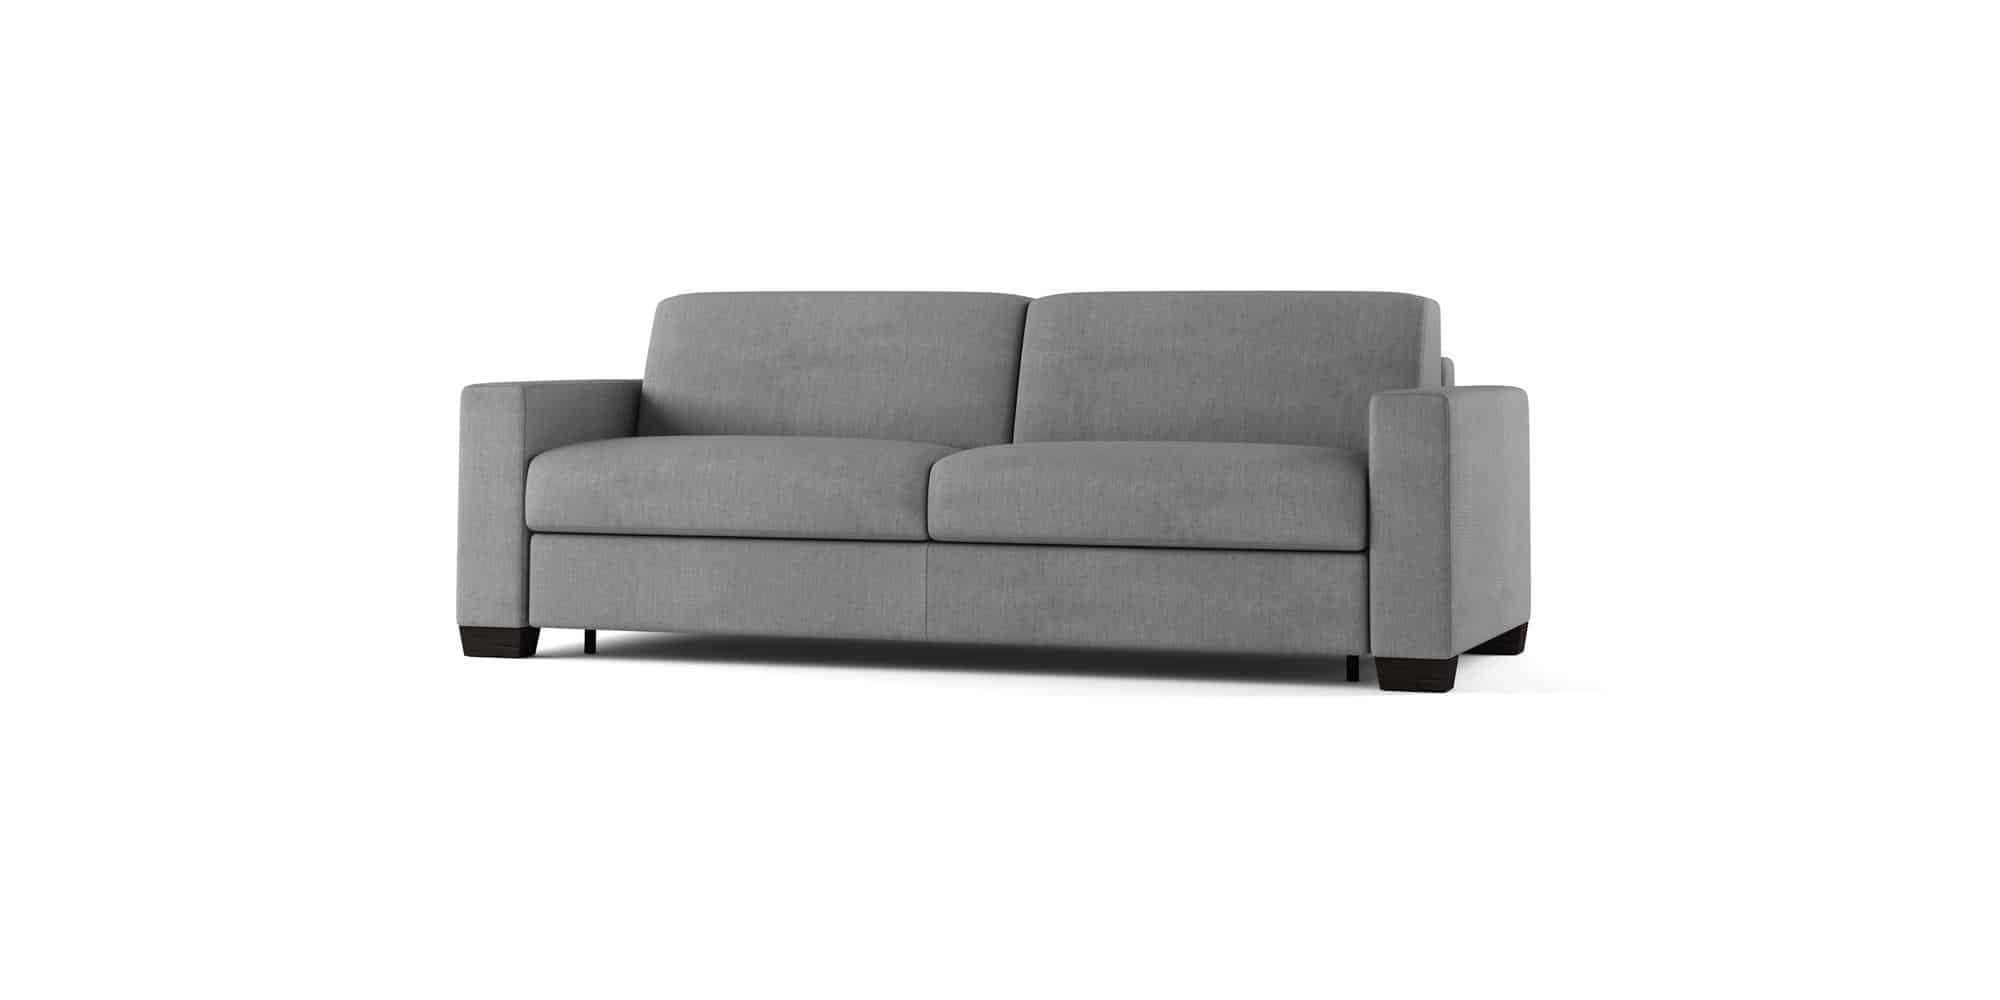 Amerigo large – Divano letto 3 posti XL – 214×100(204)